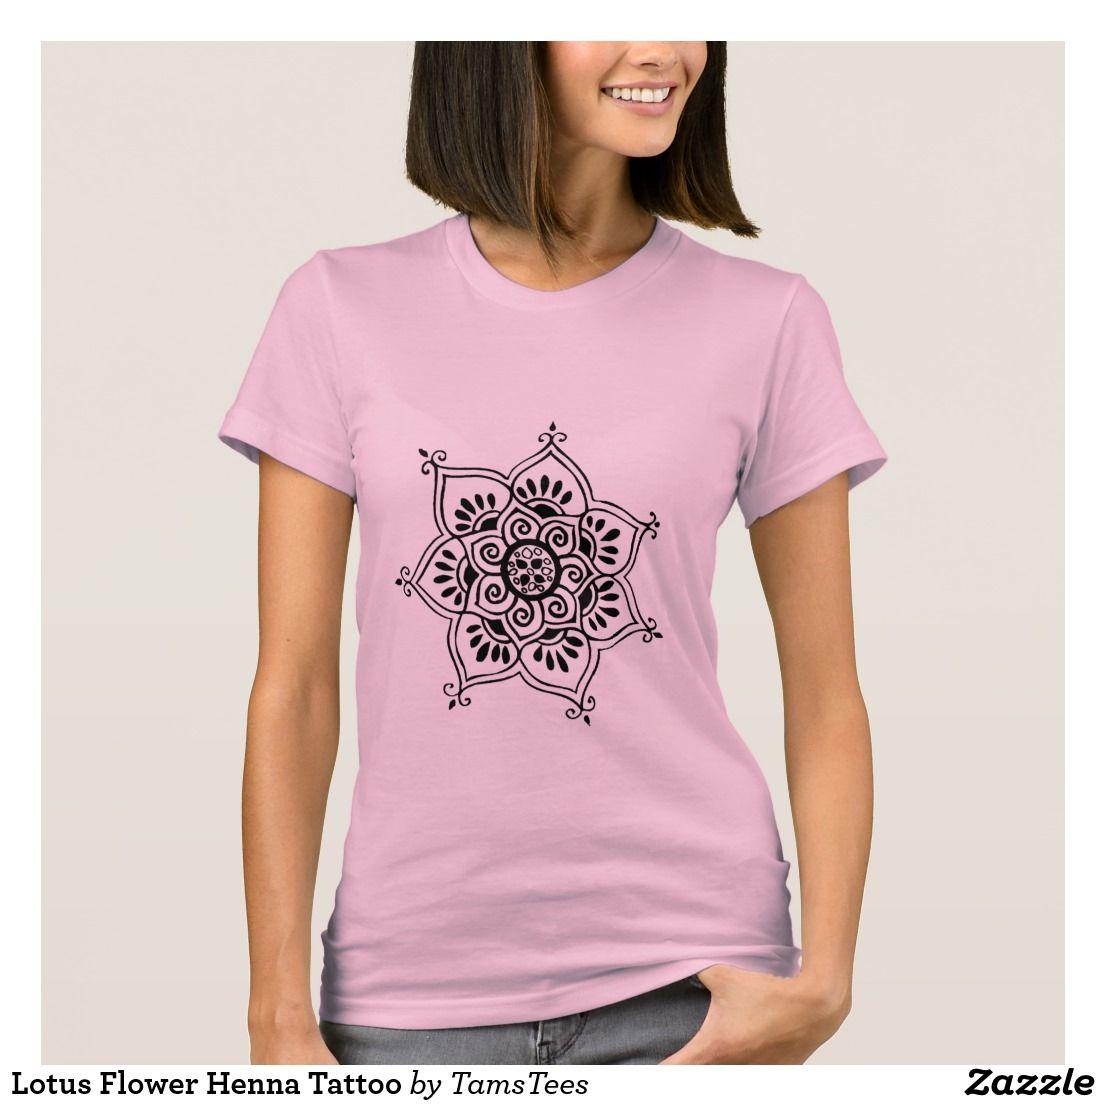 Lotus flower henna tattoo t shirt lotus flower henna flower henna lotus flower henna tattoo t shirt izmirmasajfo Images